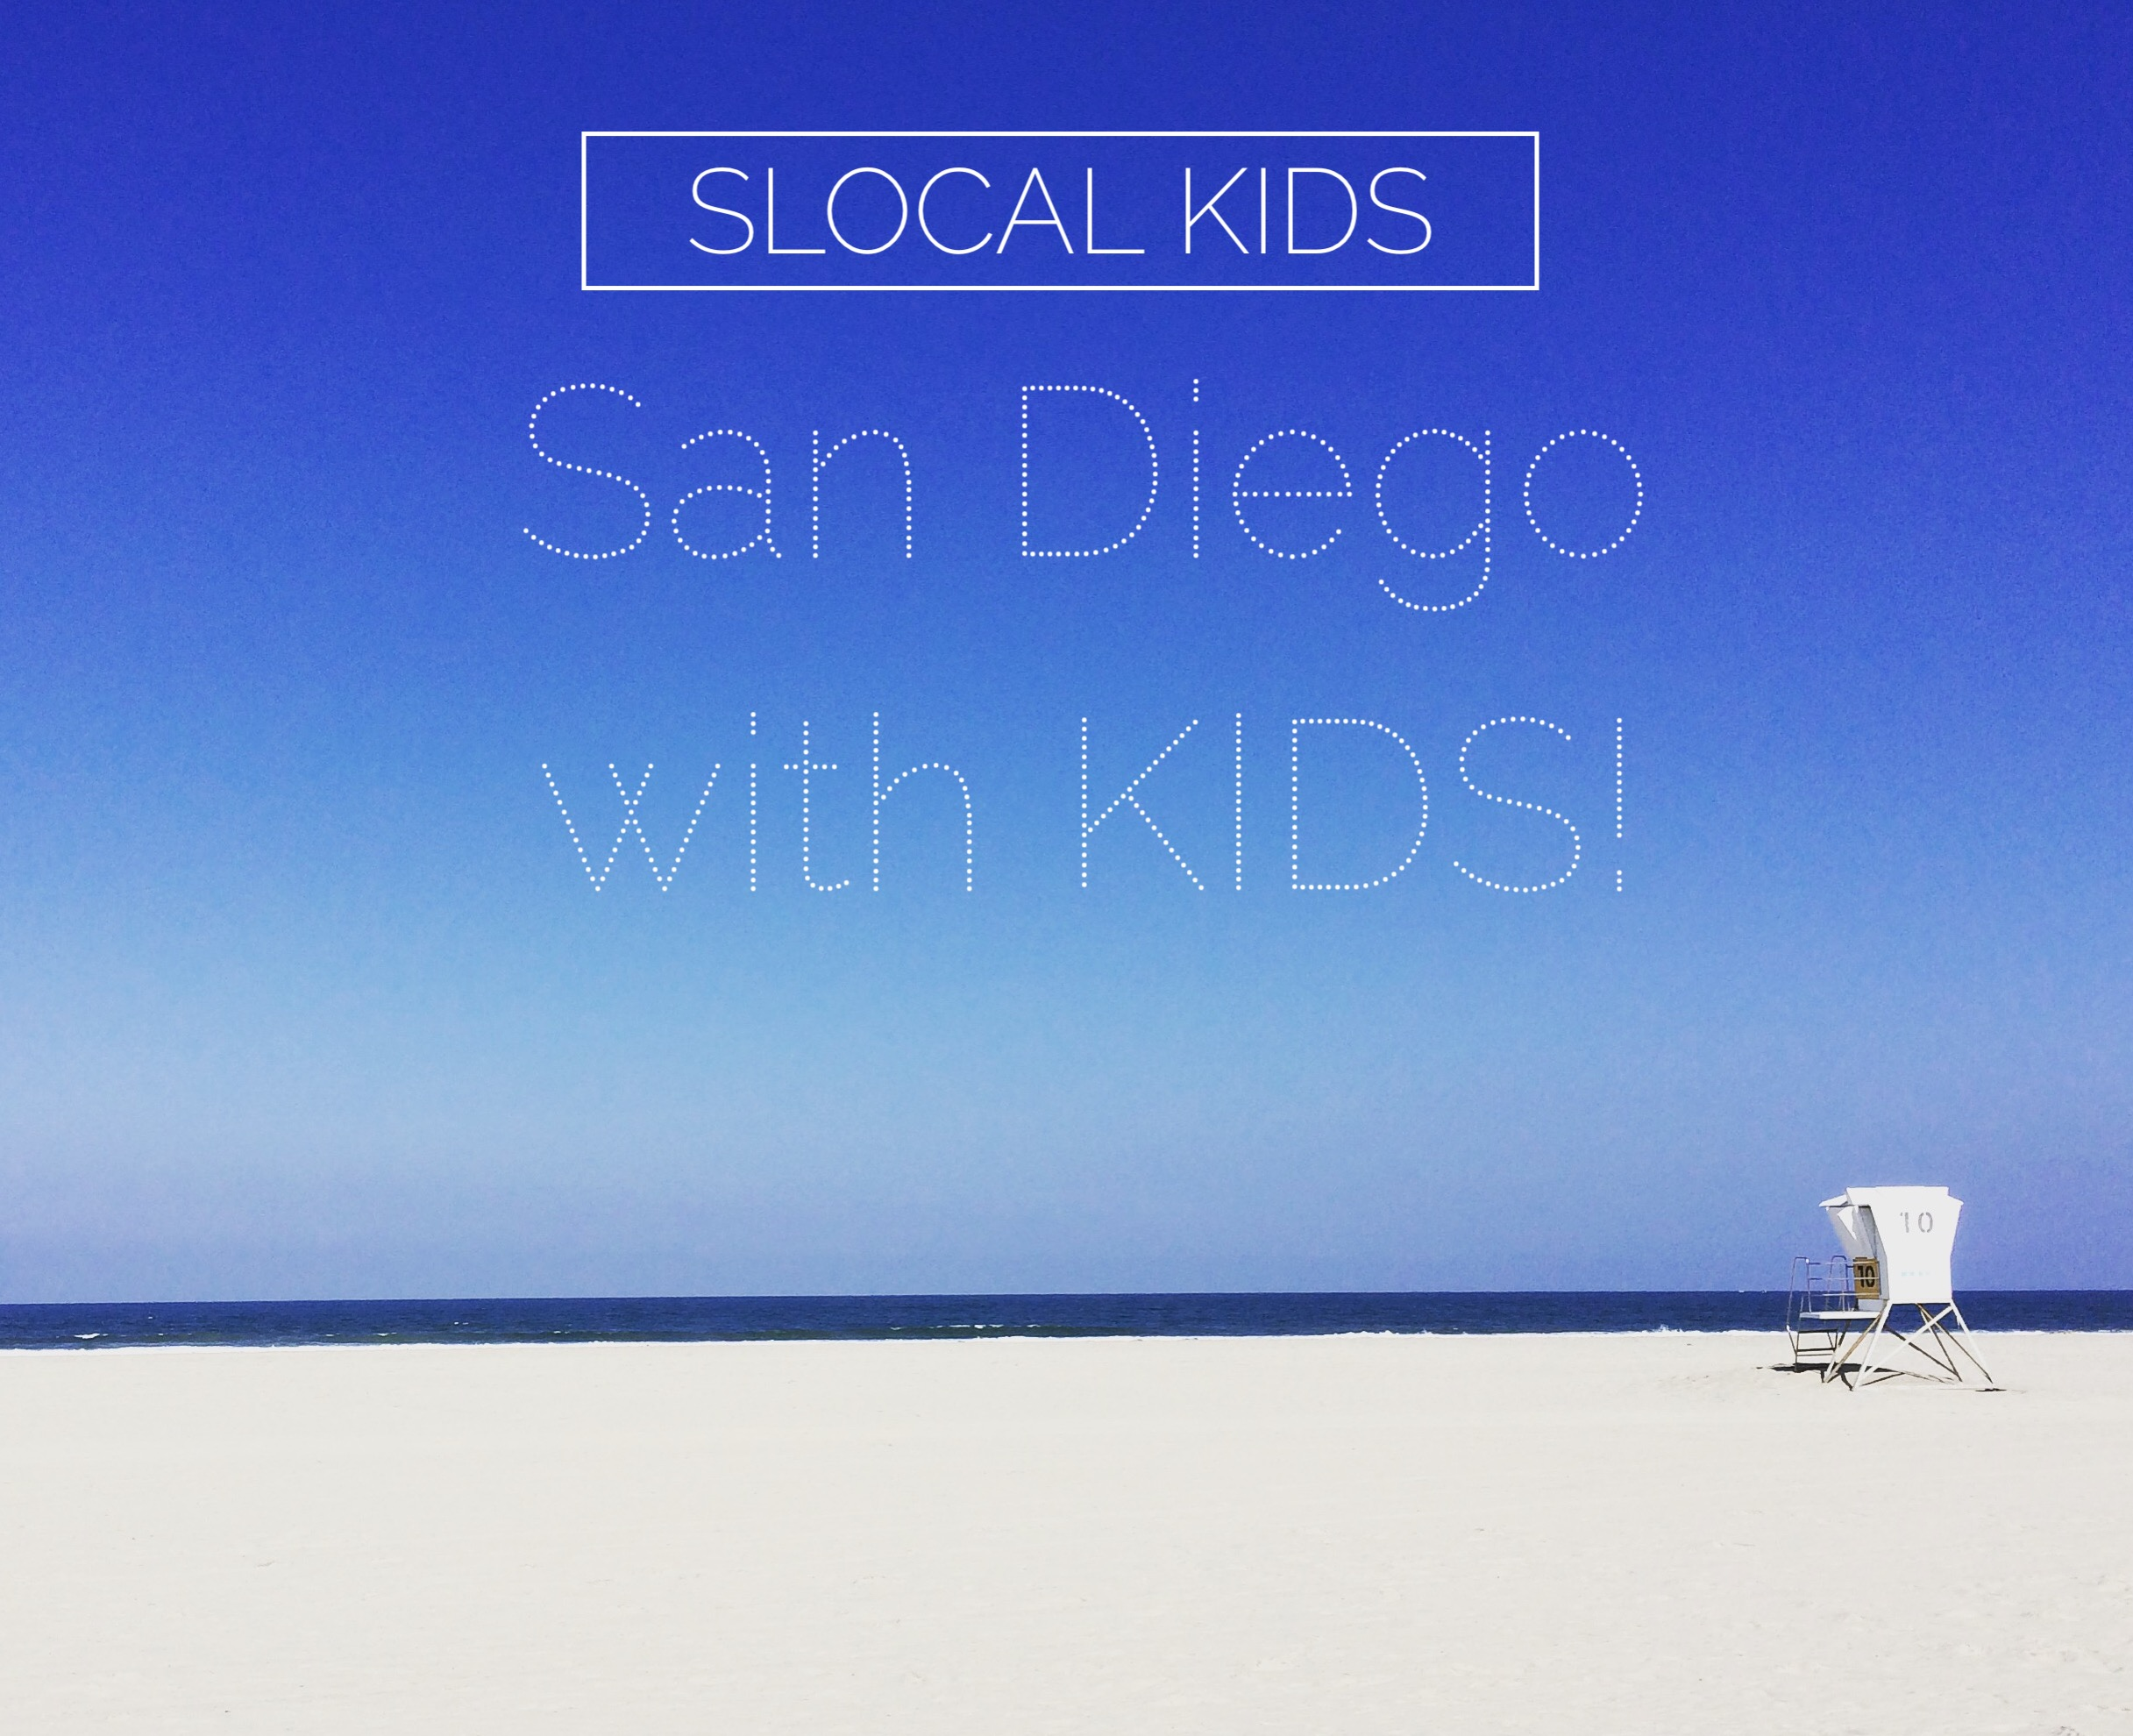 San Diego Road Trip with Kids